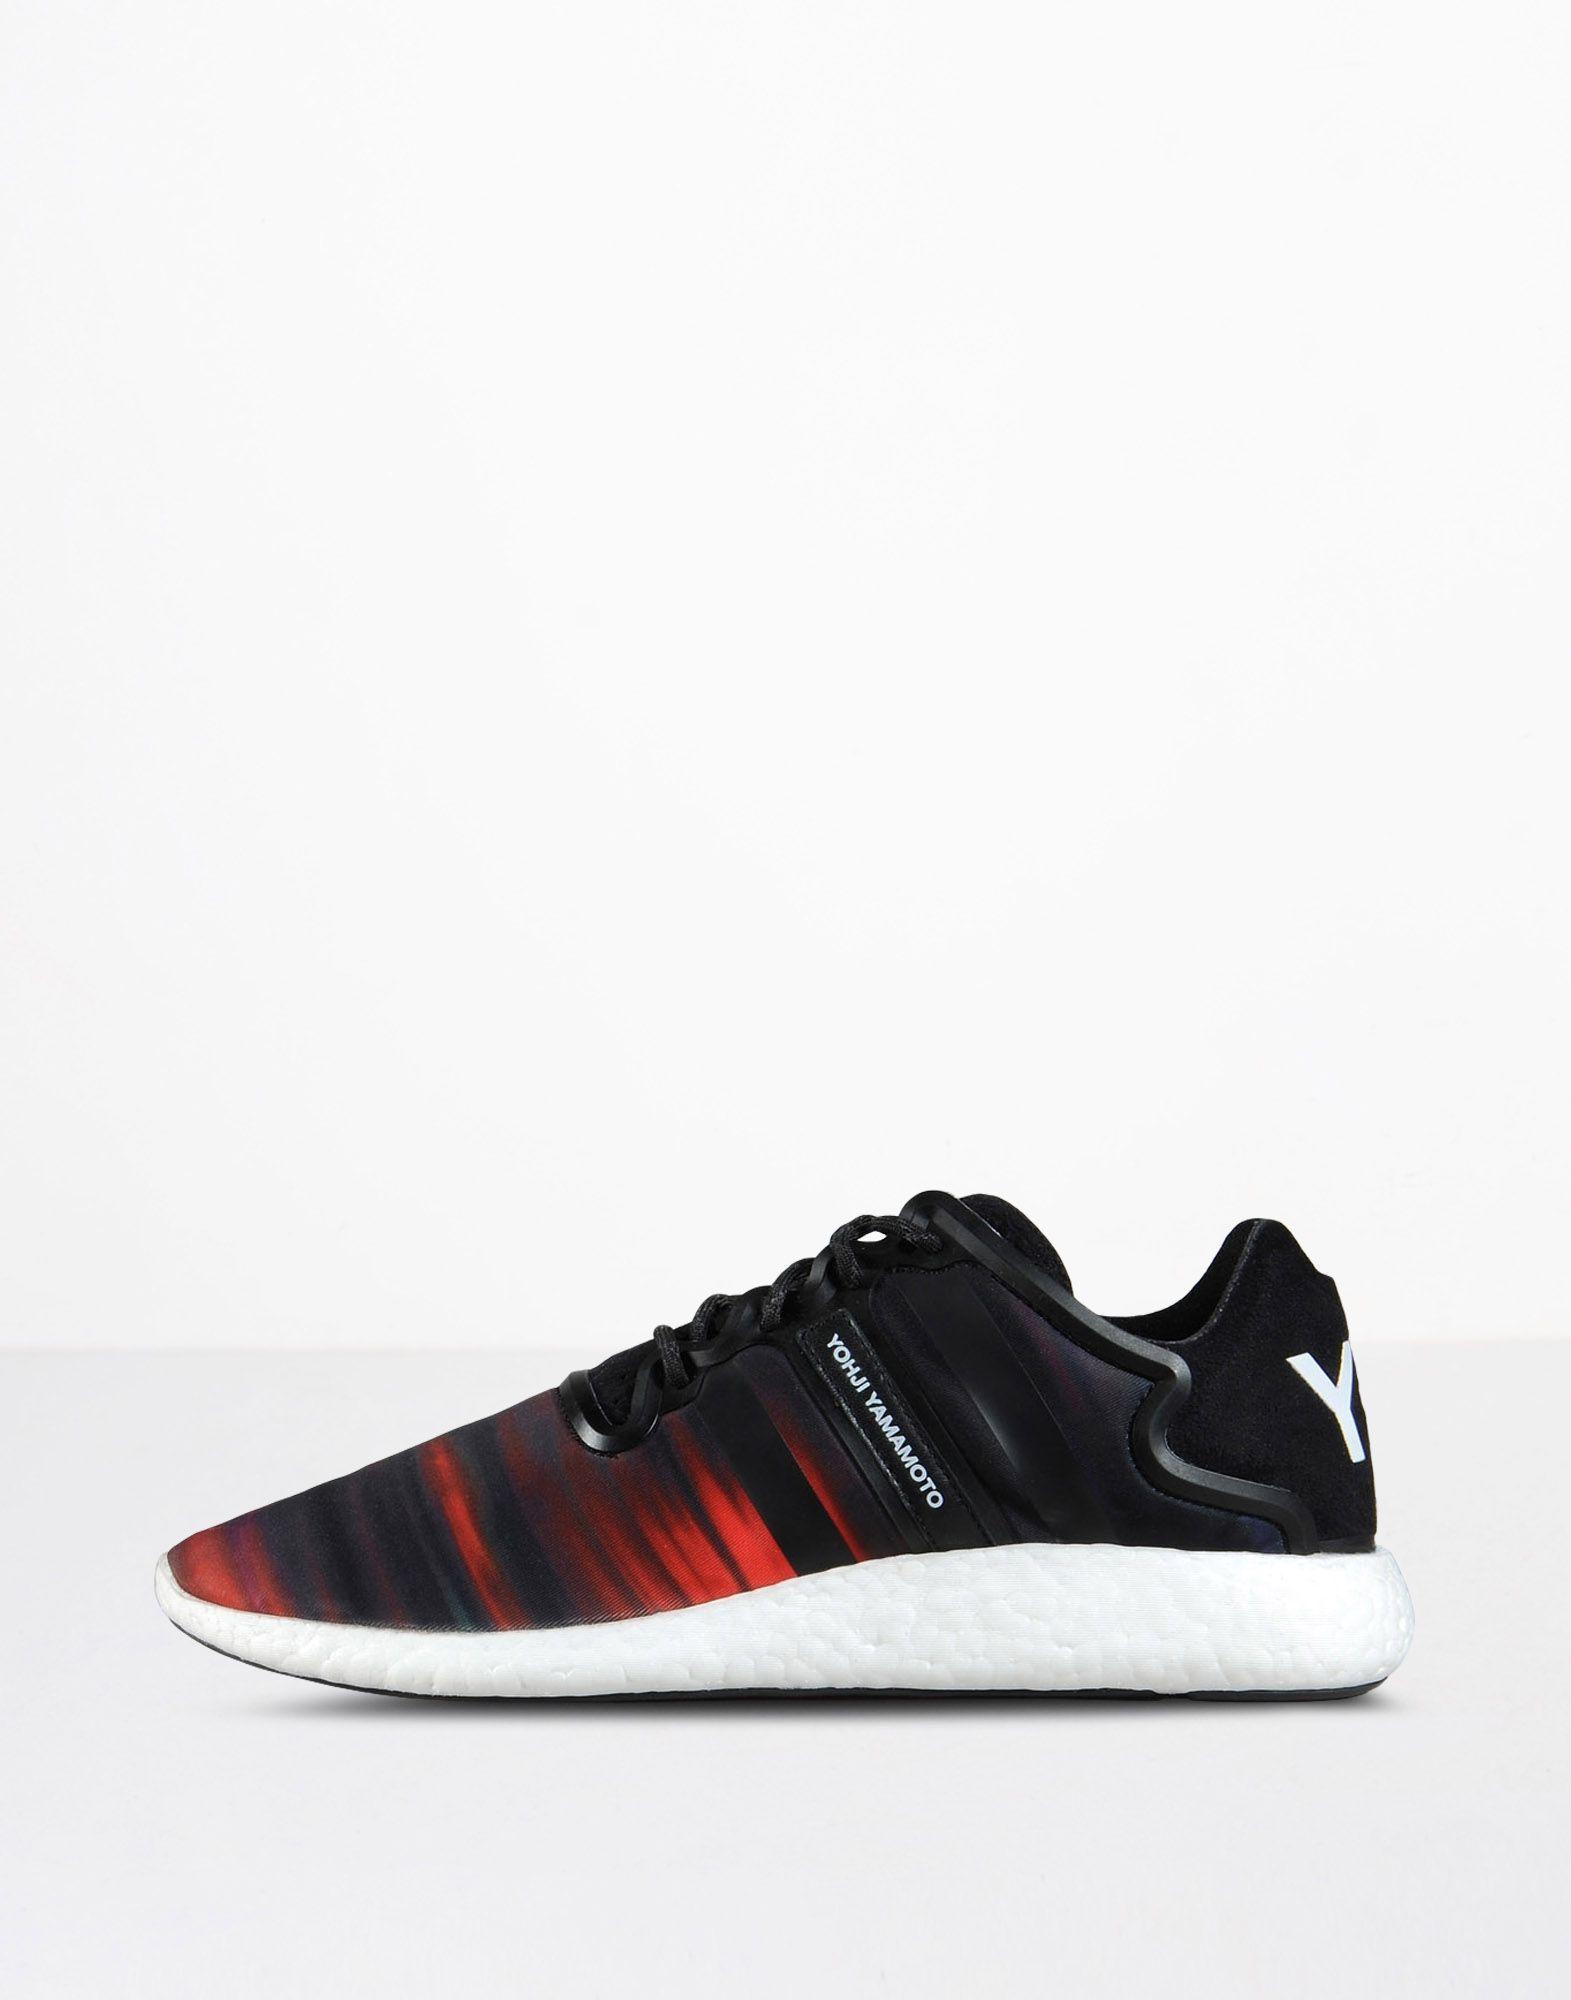 b0a7758562f28 ... Y-3 Y-3 YOHJI RUN Sneakers Man ...